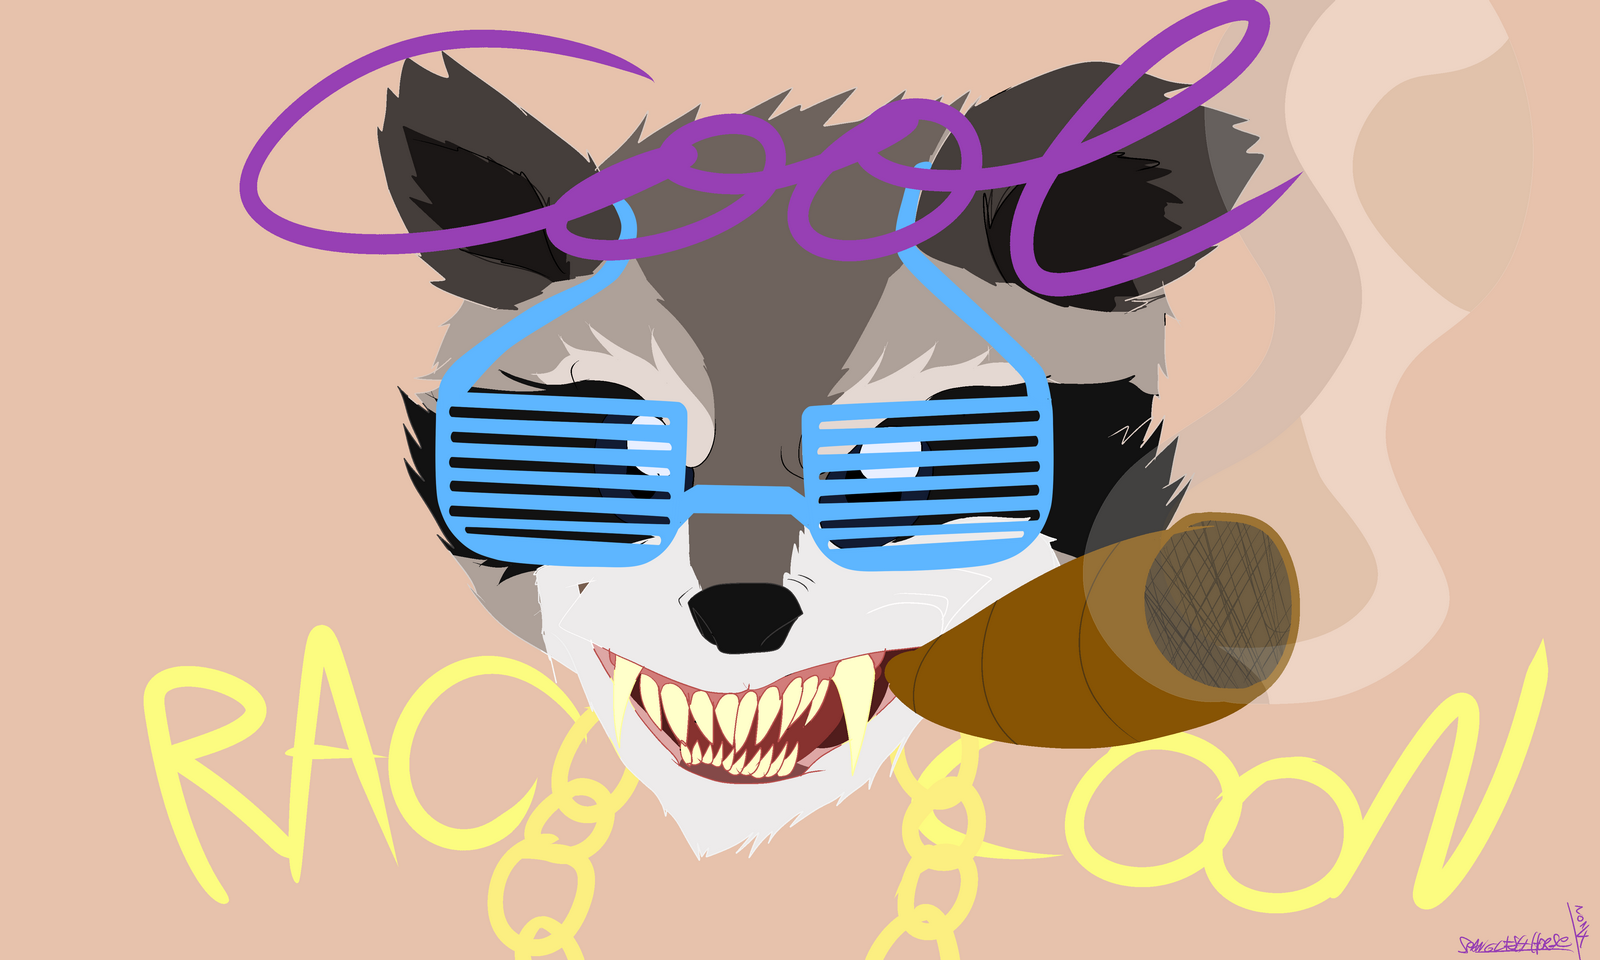 Cool Raccon